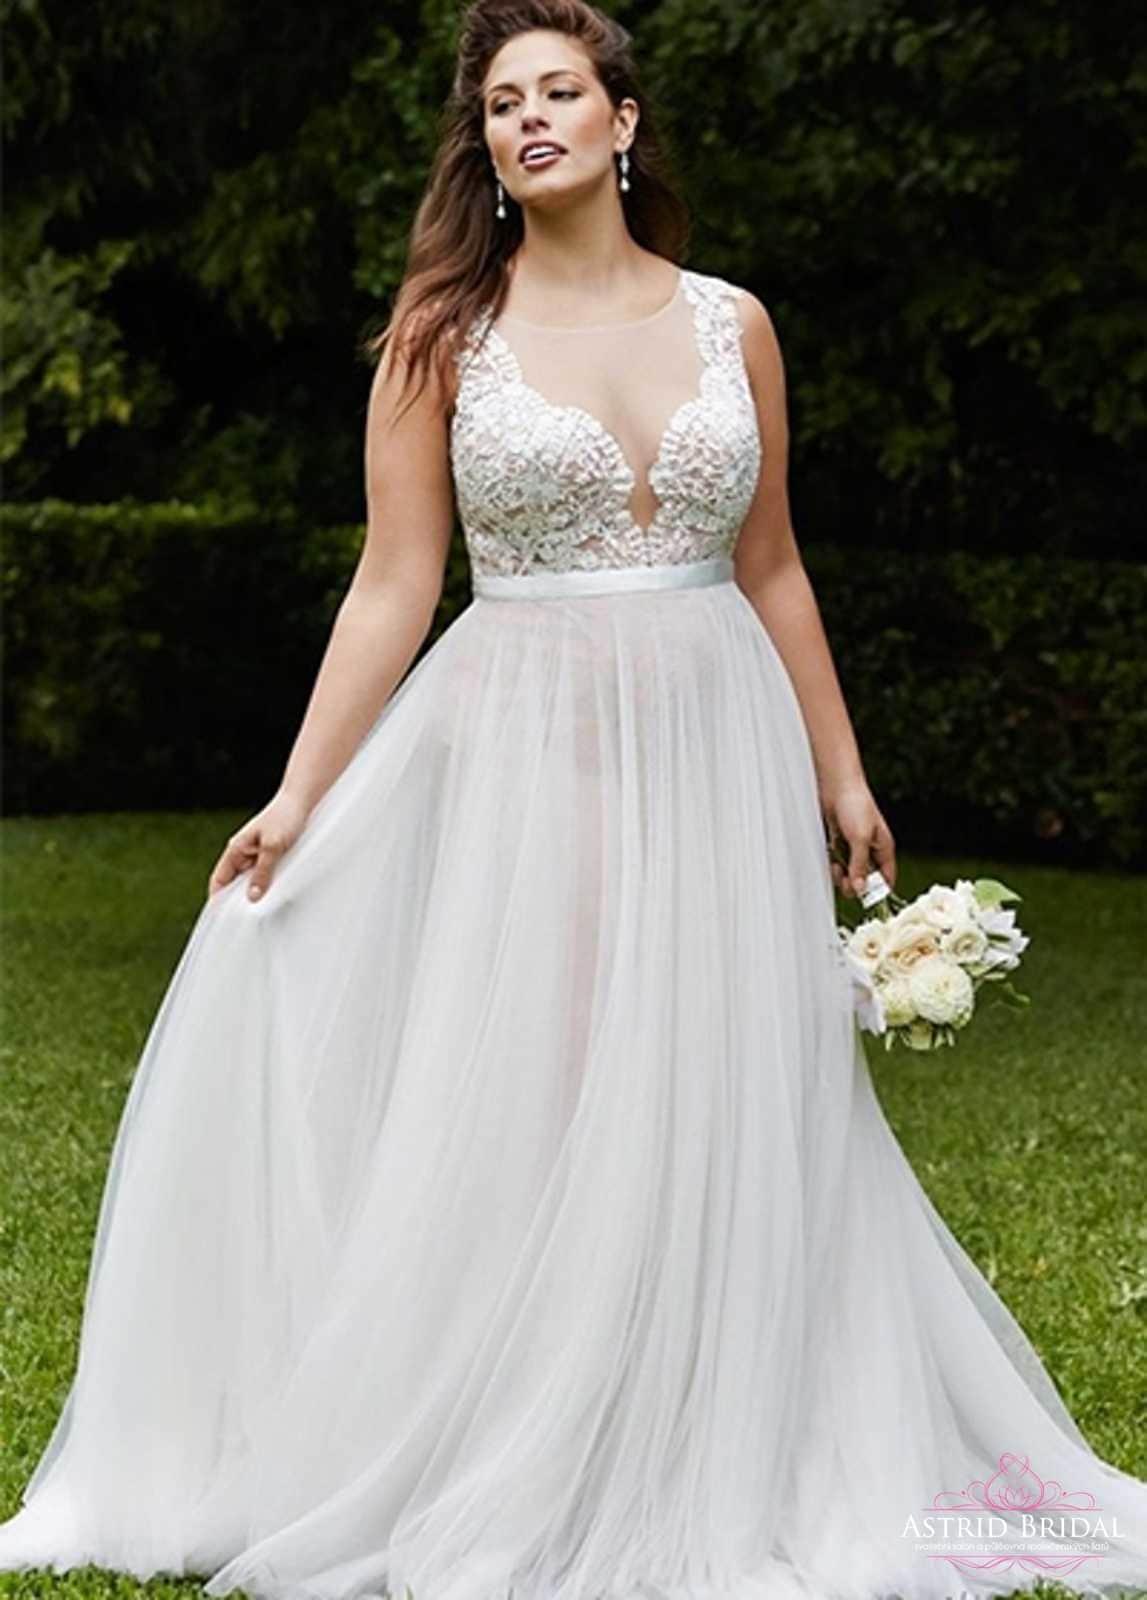 plus size wedding dresses - 683×1024